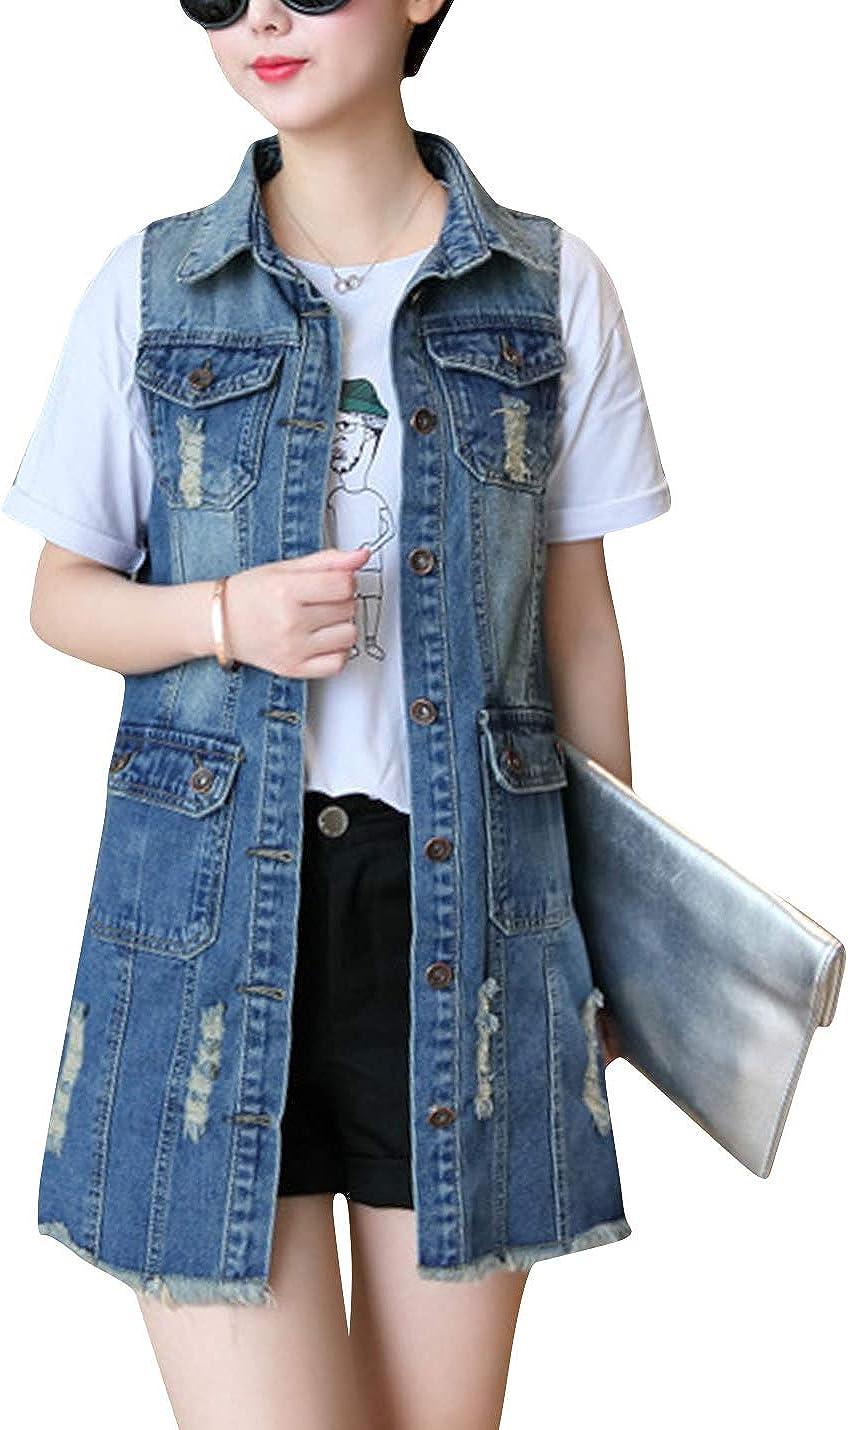 ZGZZ7 Women's Vintage Broken Denim Vests Buttons Sleeveless Mid-Long Jean Jackets Gilet Waistcoats